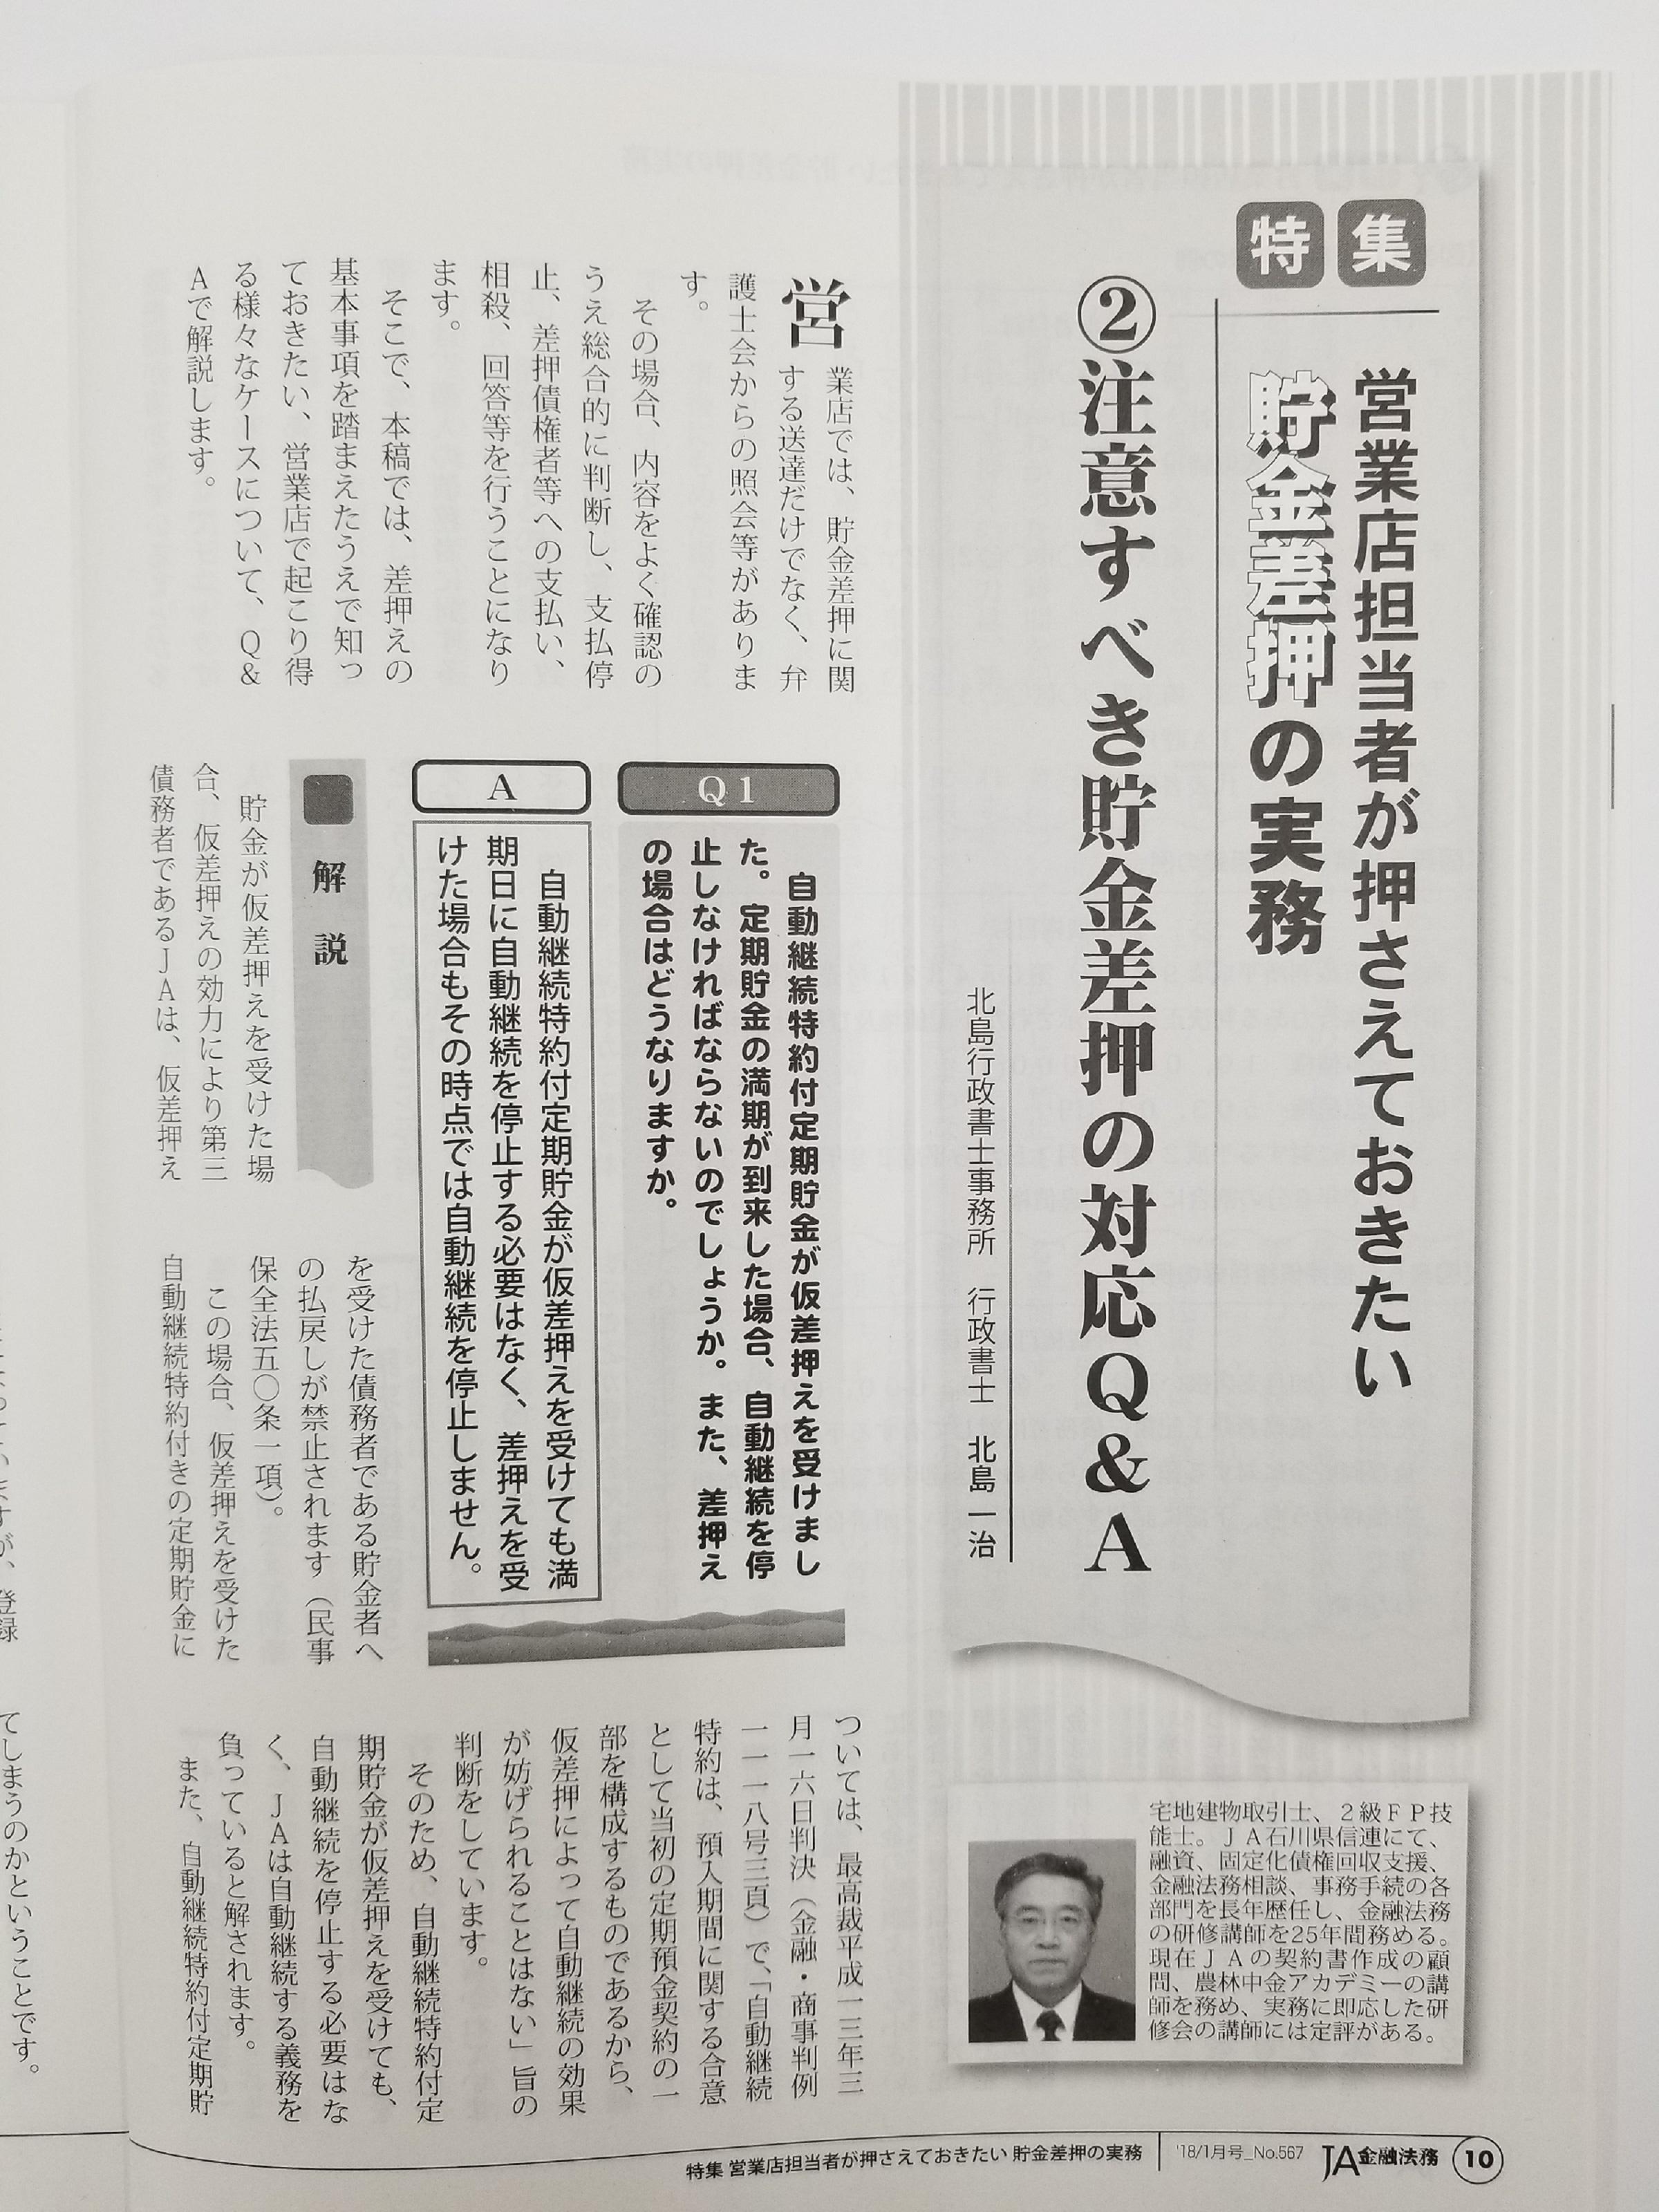 JA金融法務18年1月号掲載内容抜粋